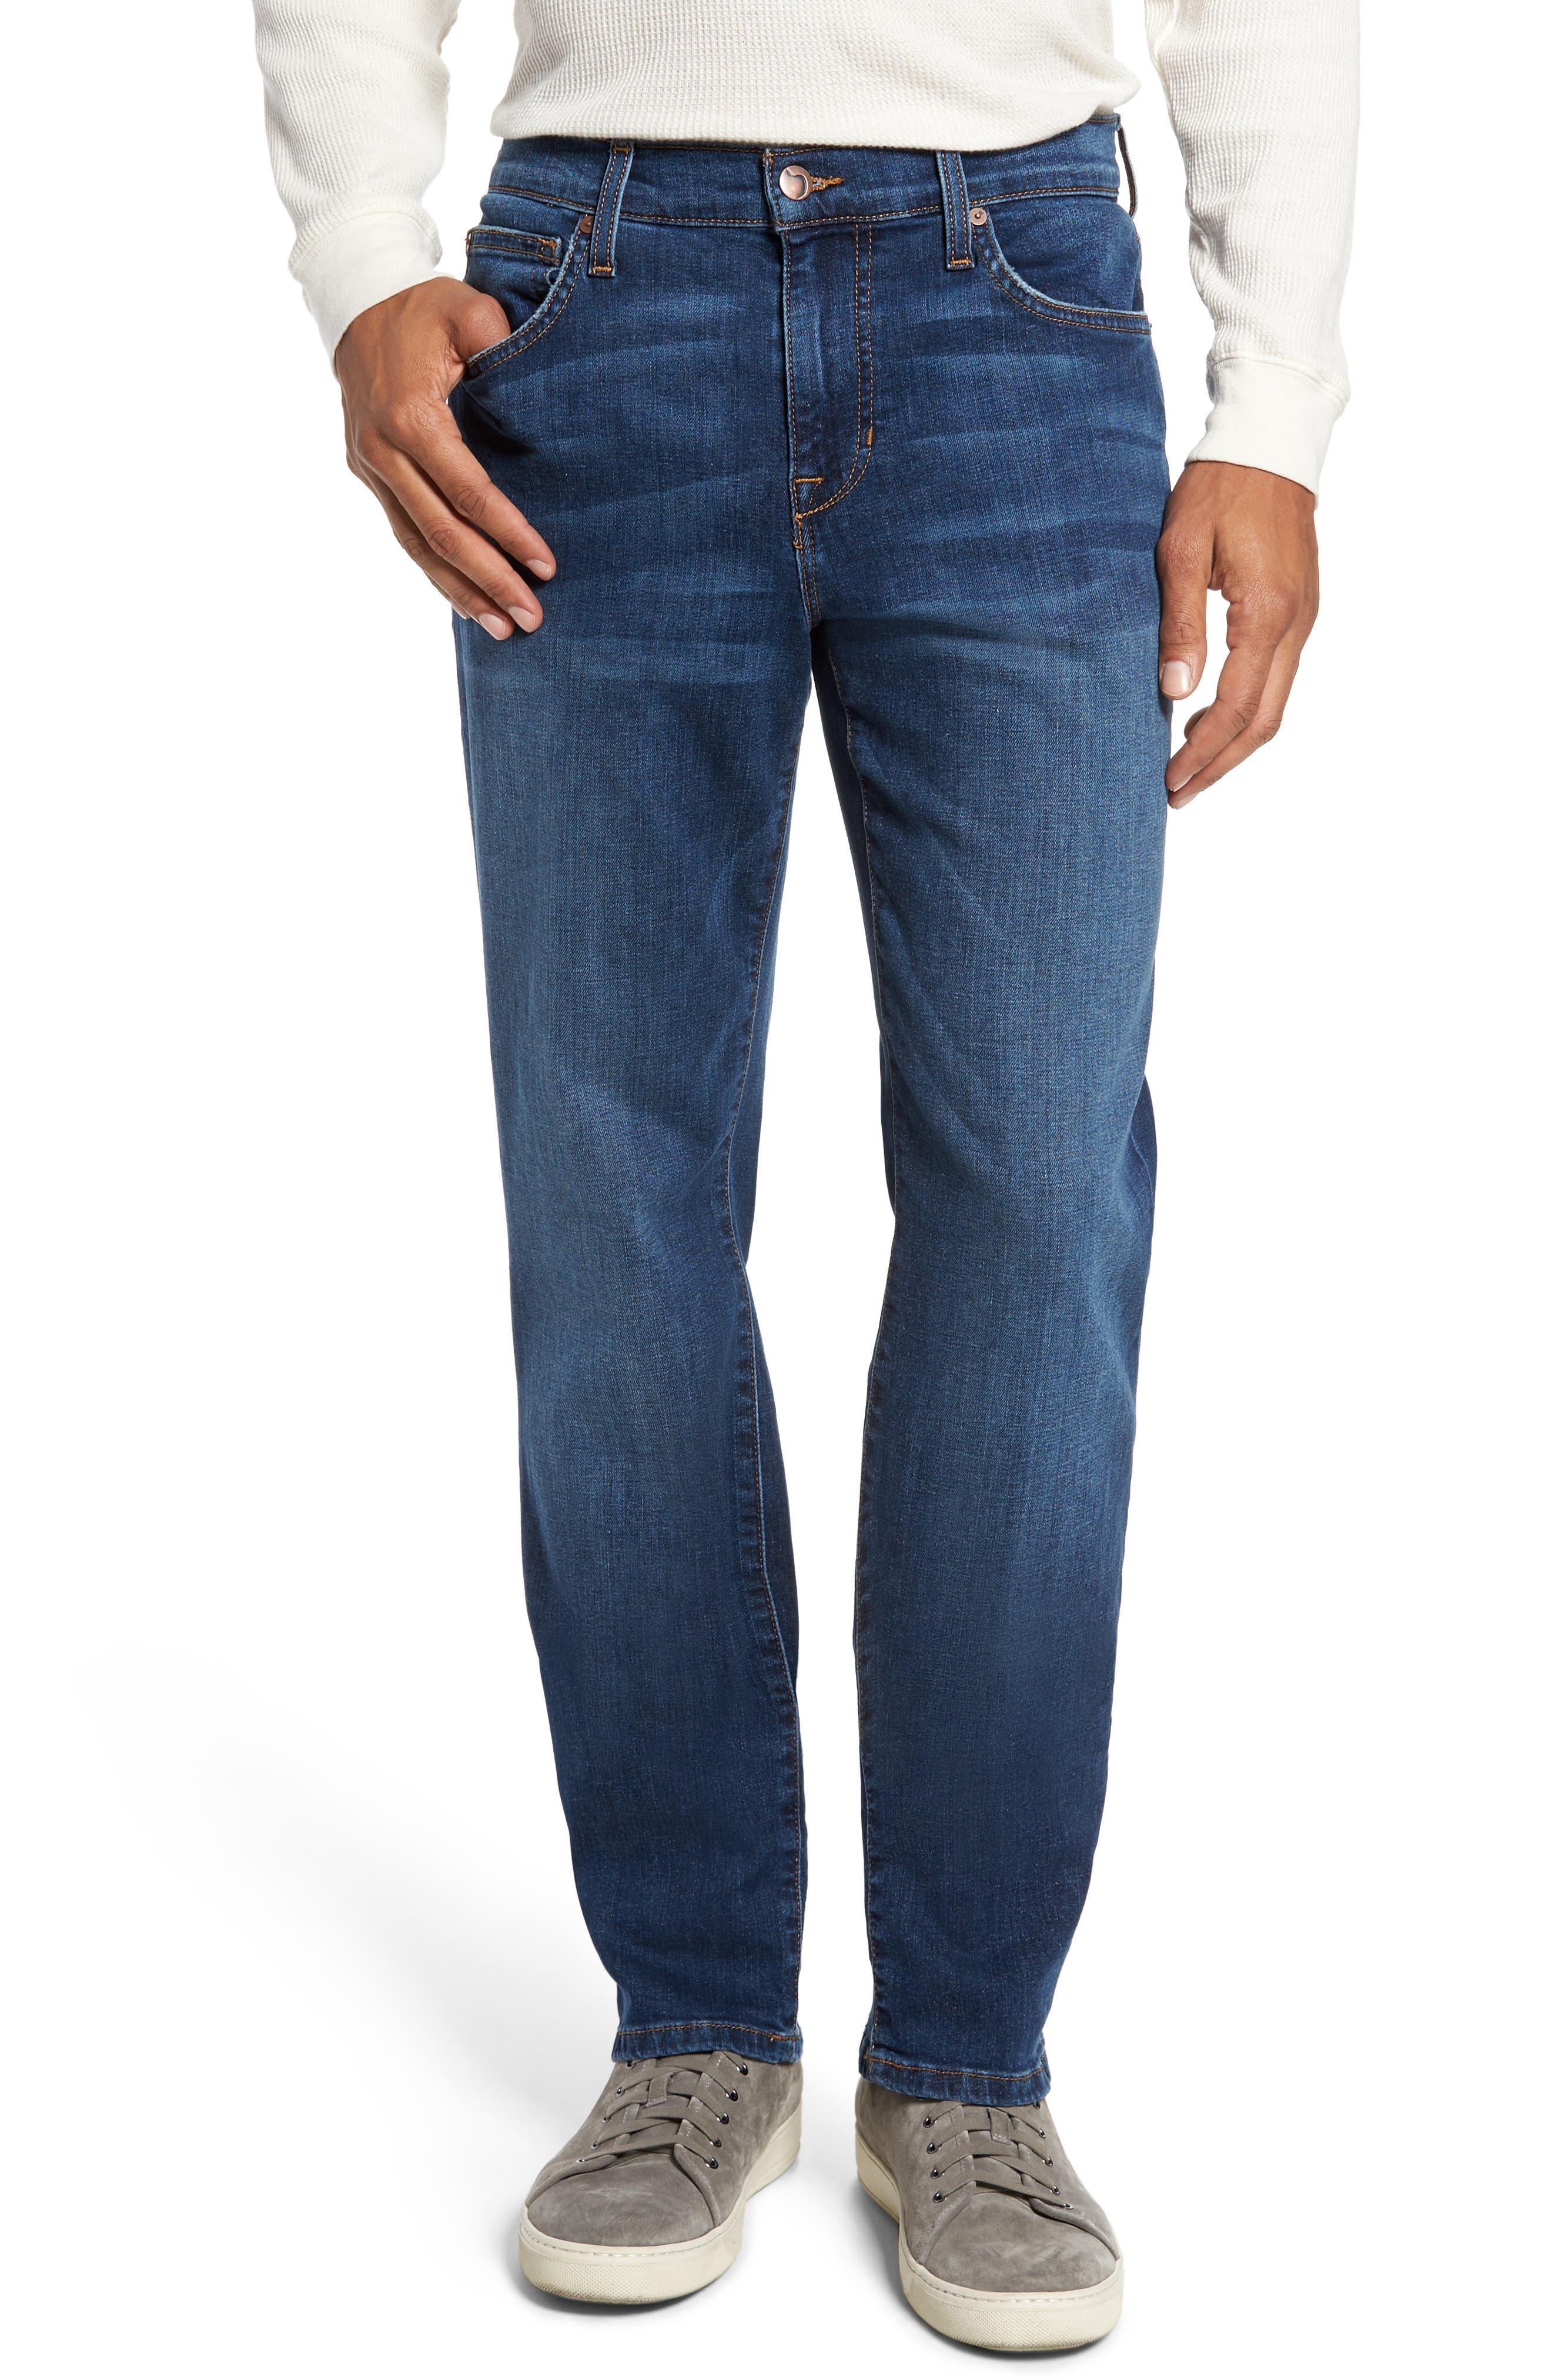 Brixton Slim Straight Leg Jeans,                             Main thumbnail 1, color,                             Bradlee